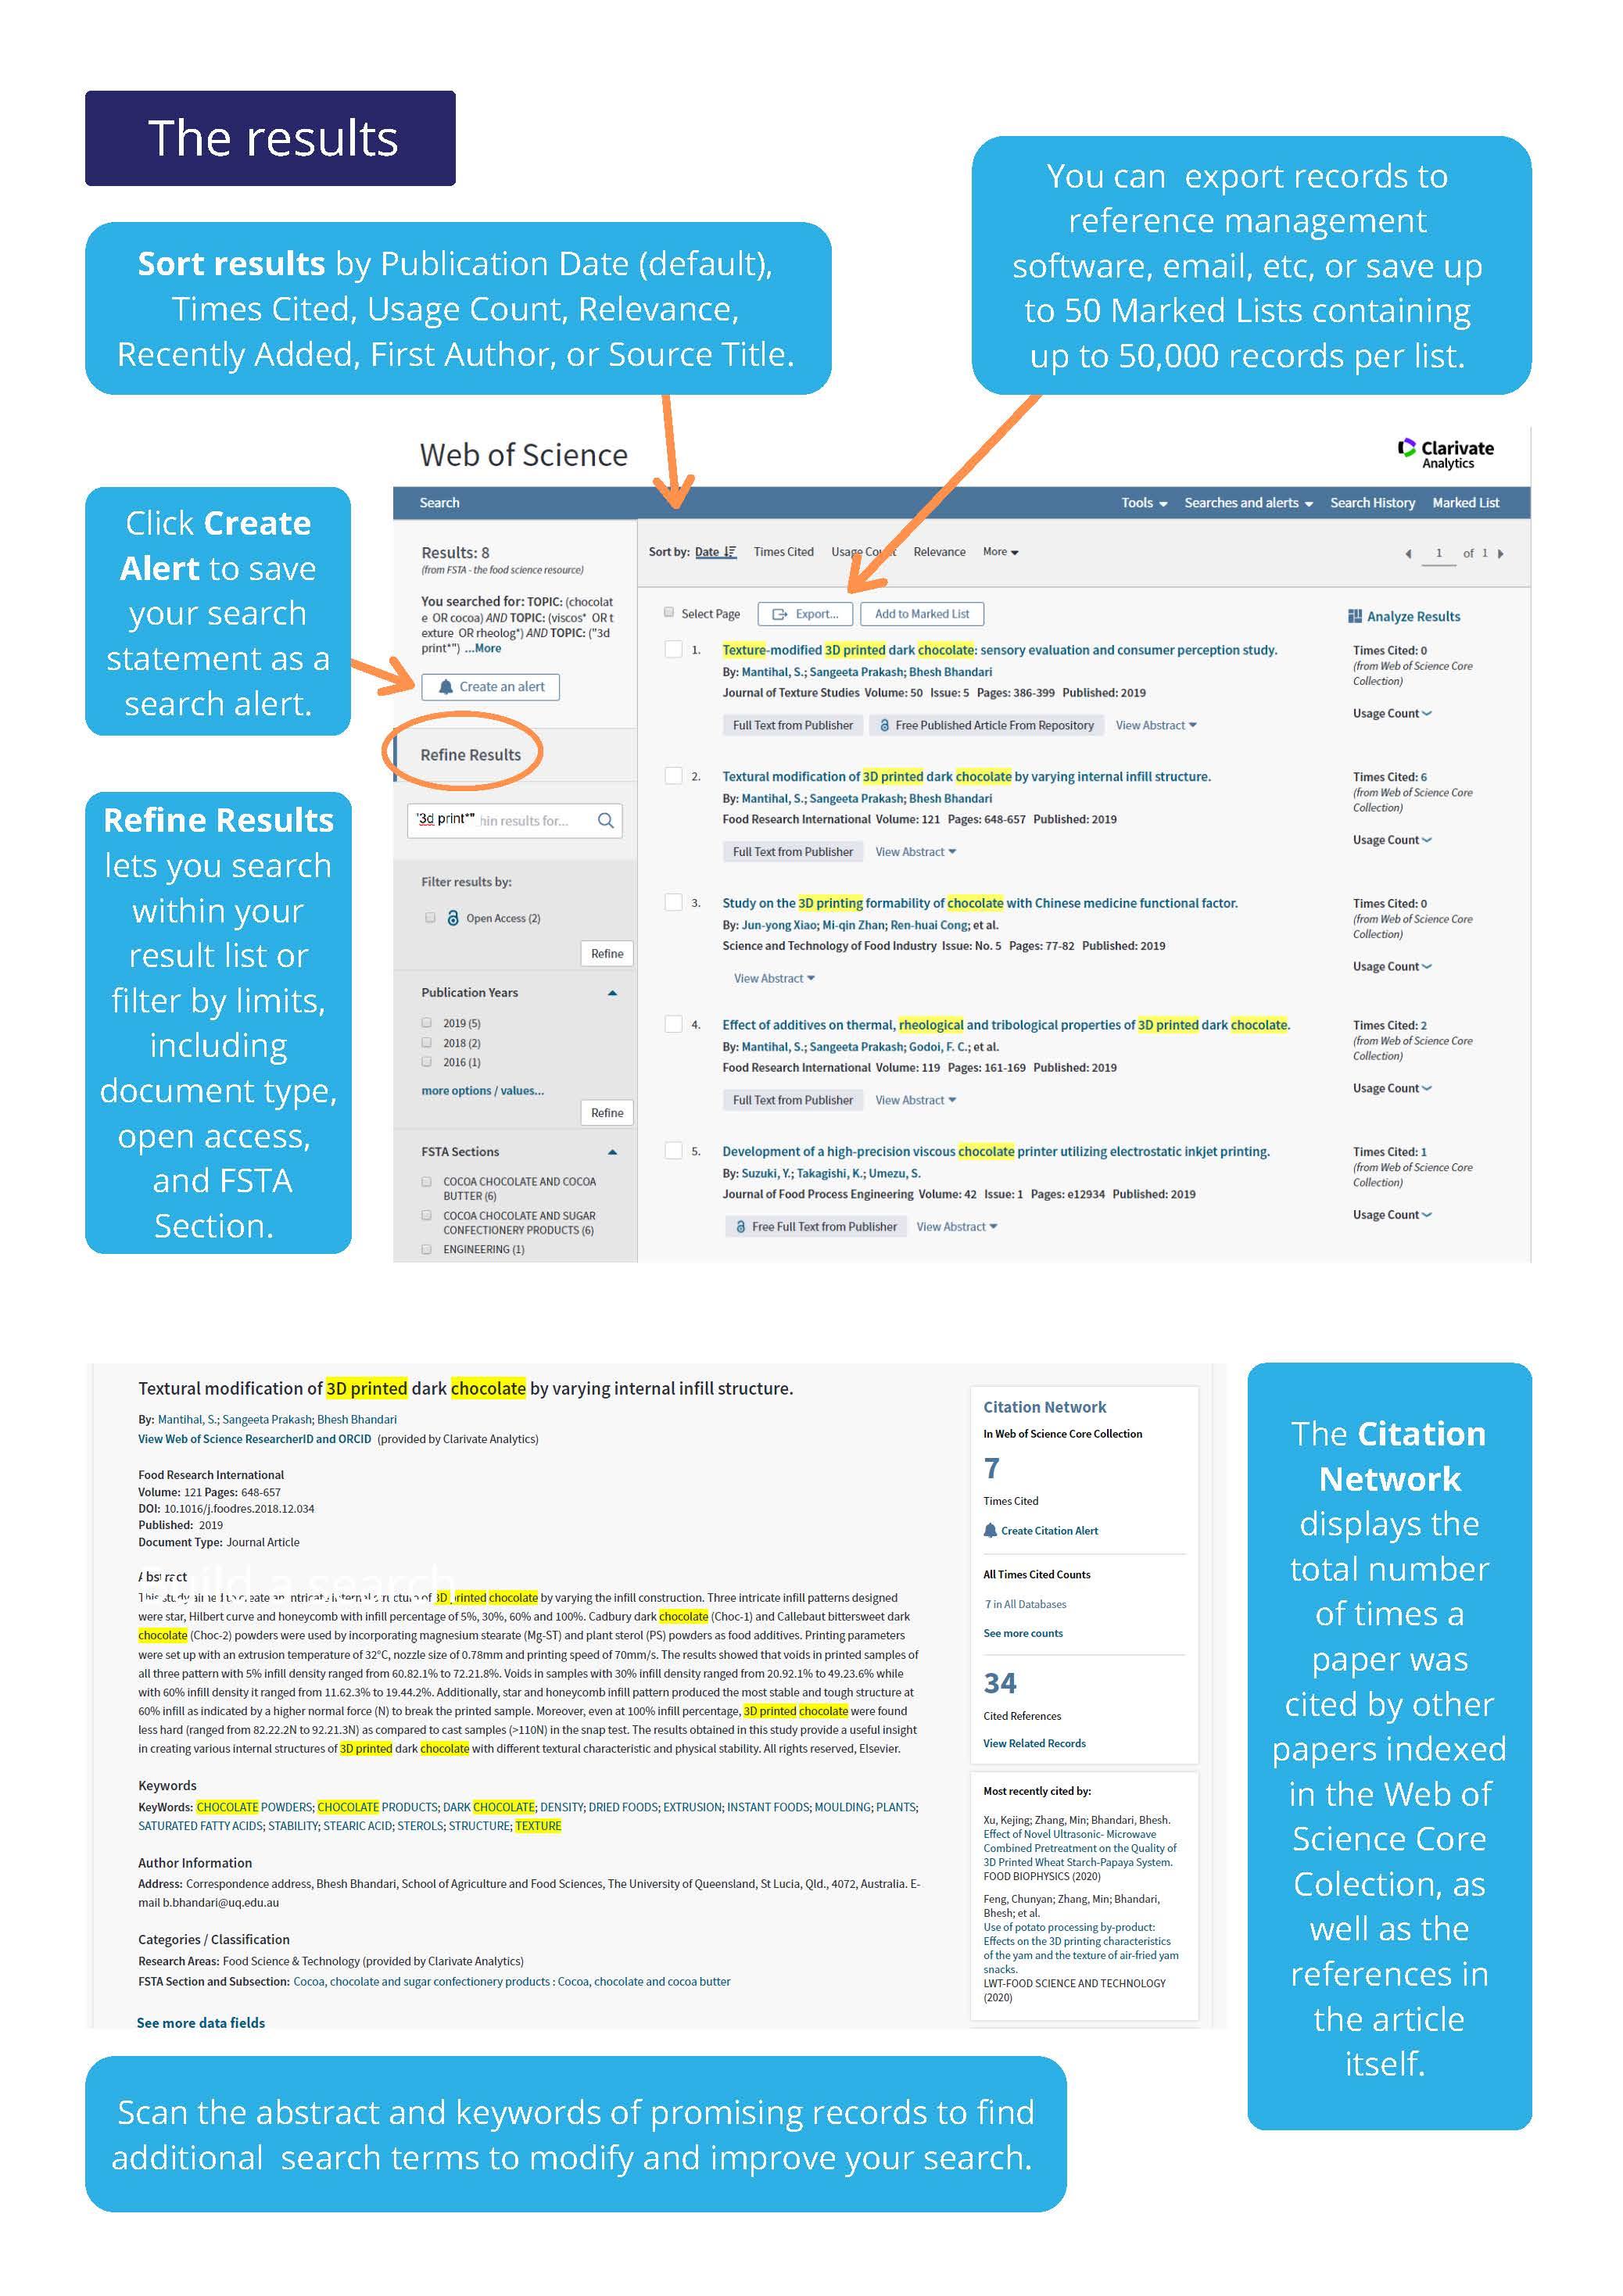 FSTA on Web of Science user guide